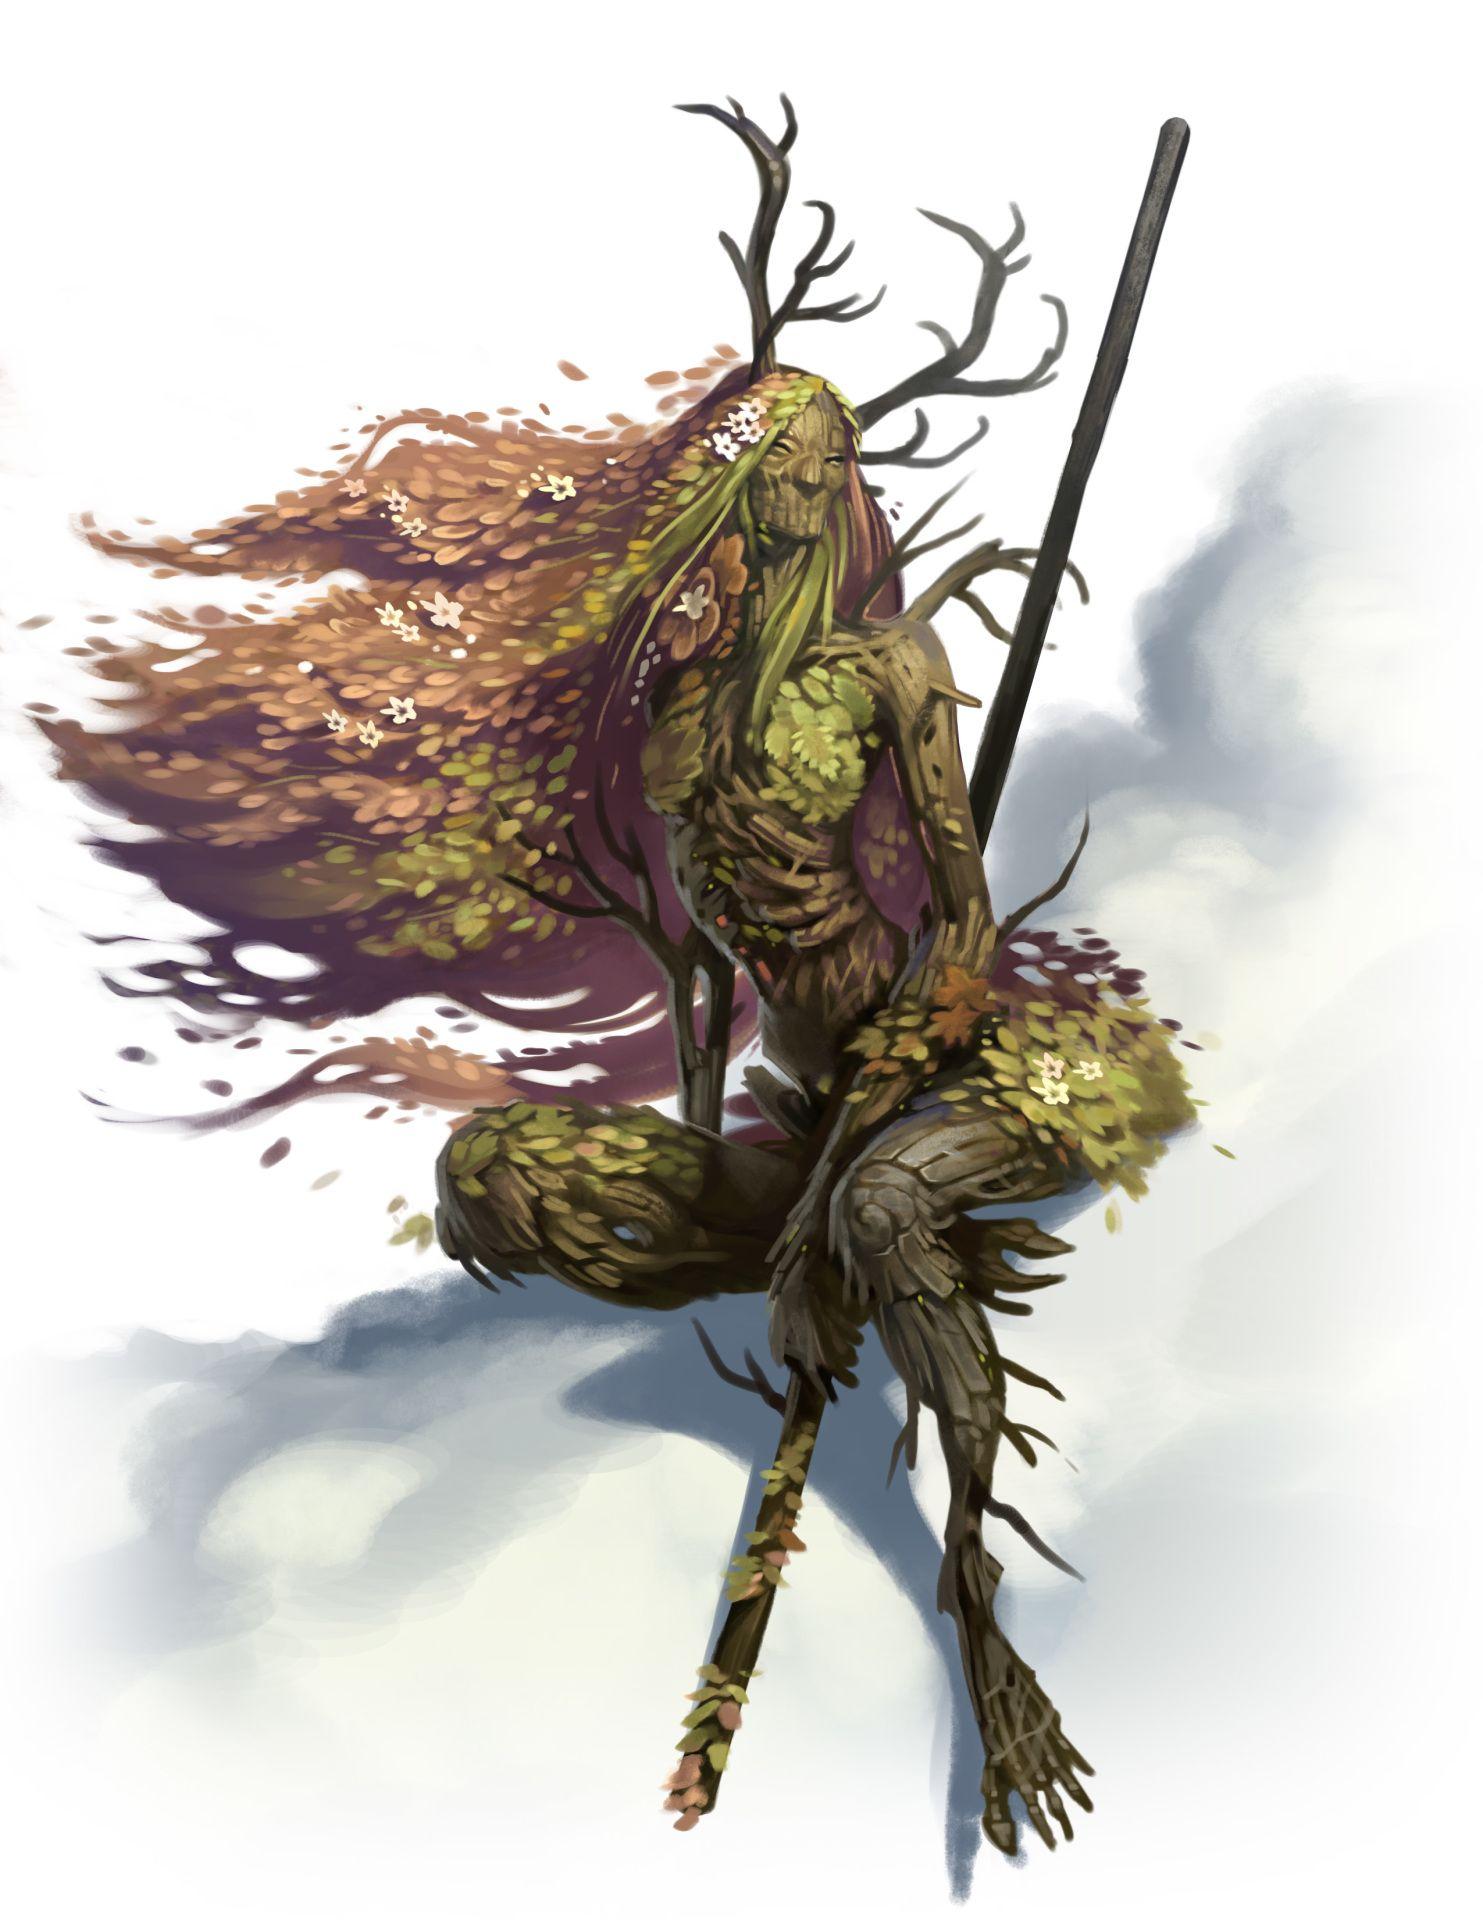 GALLERY | RPG Monster Manual in 2019 | Creature concept, Fantasy creatures, Fantasy  art